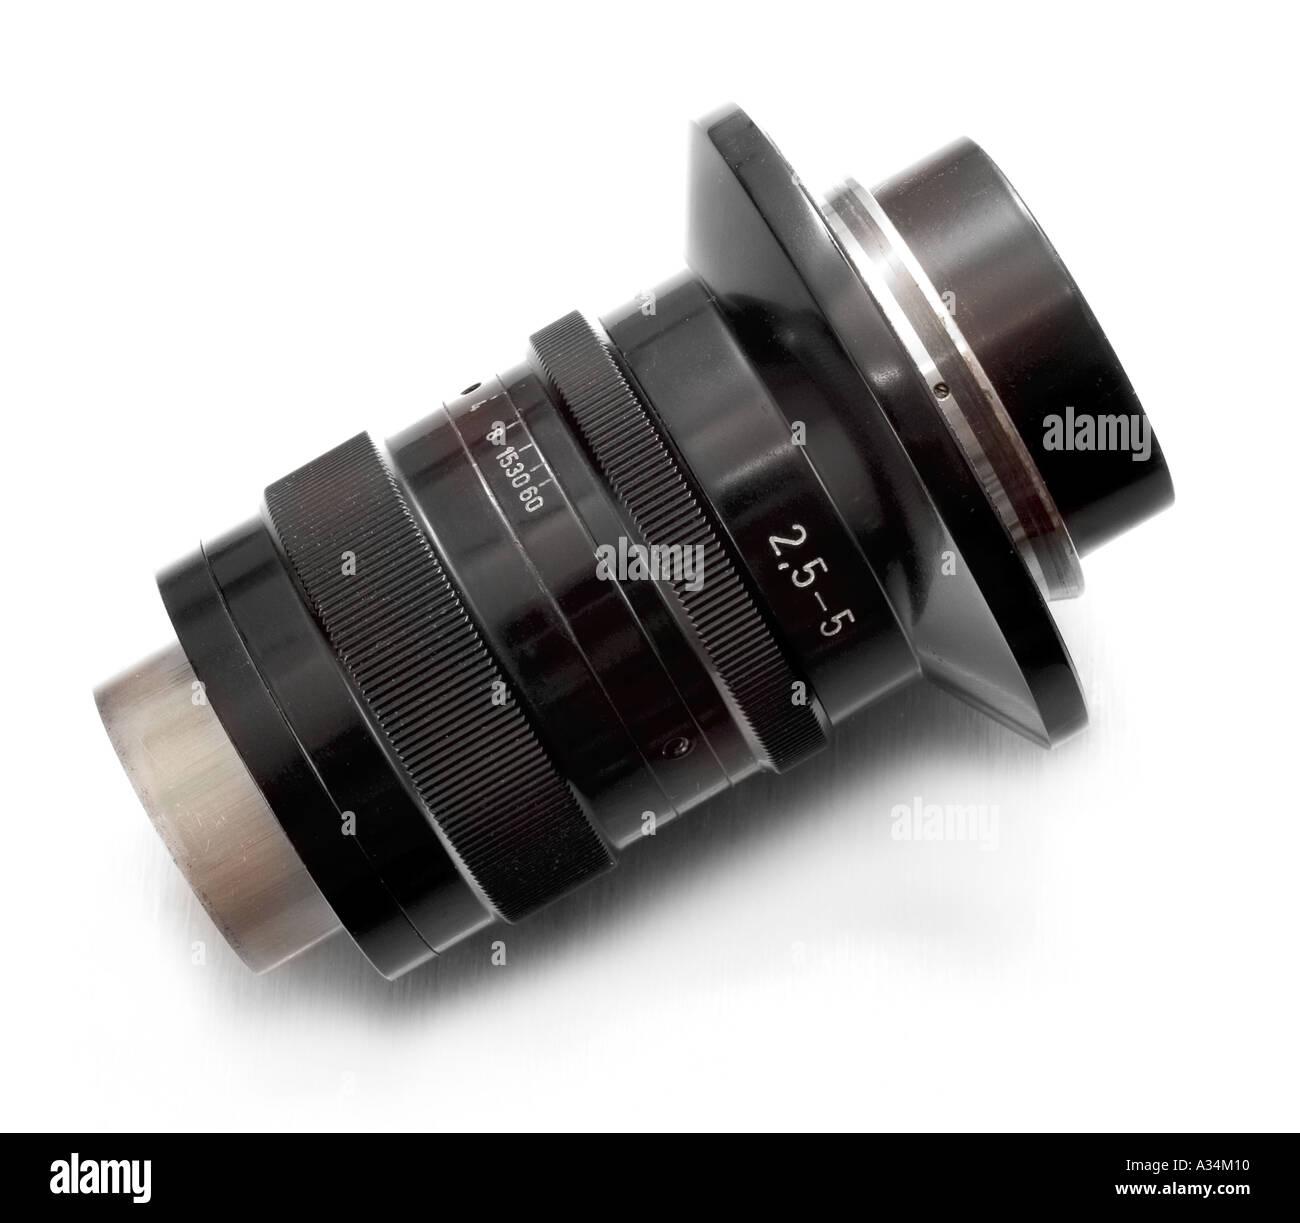 Zeiss Luminar macro zoom lens - Stock Image